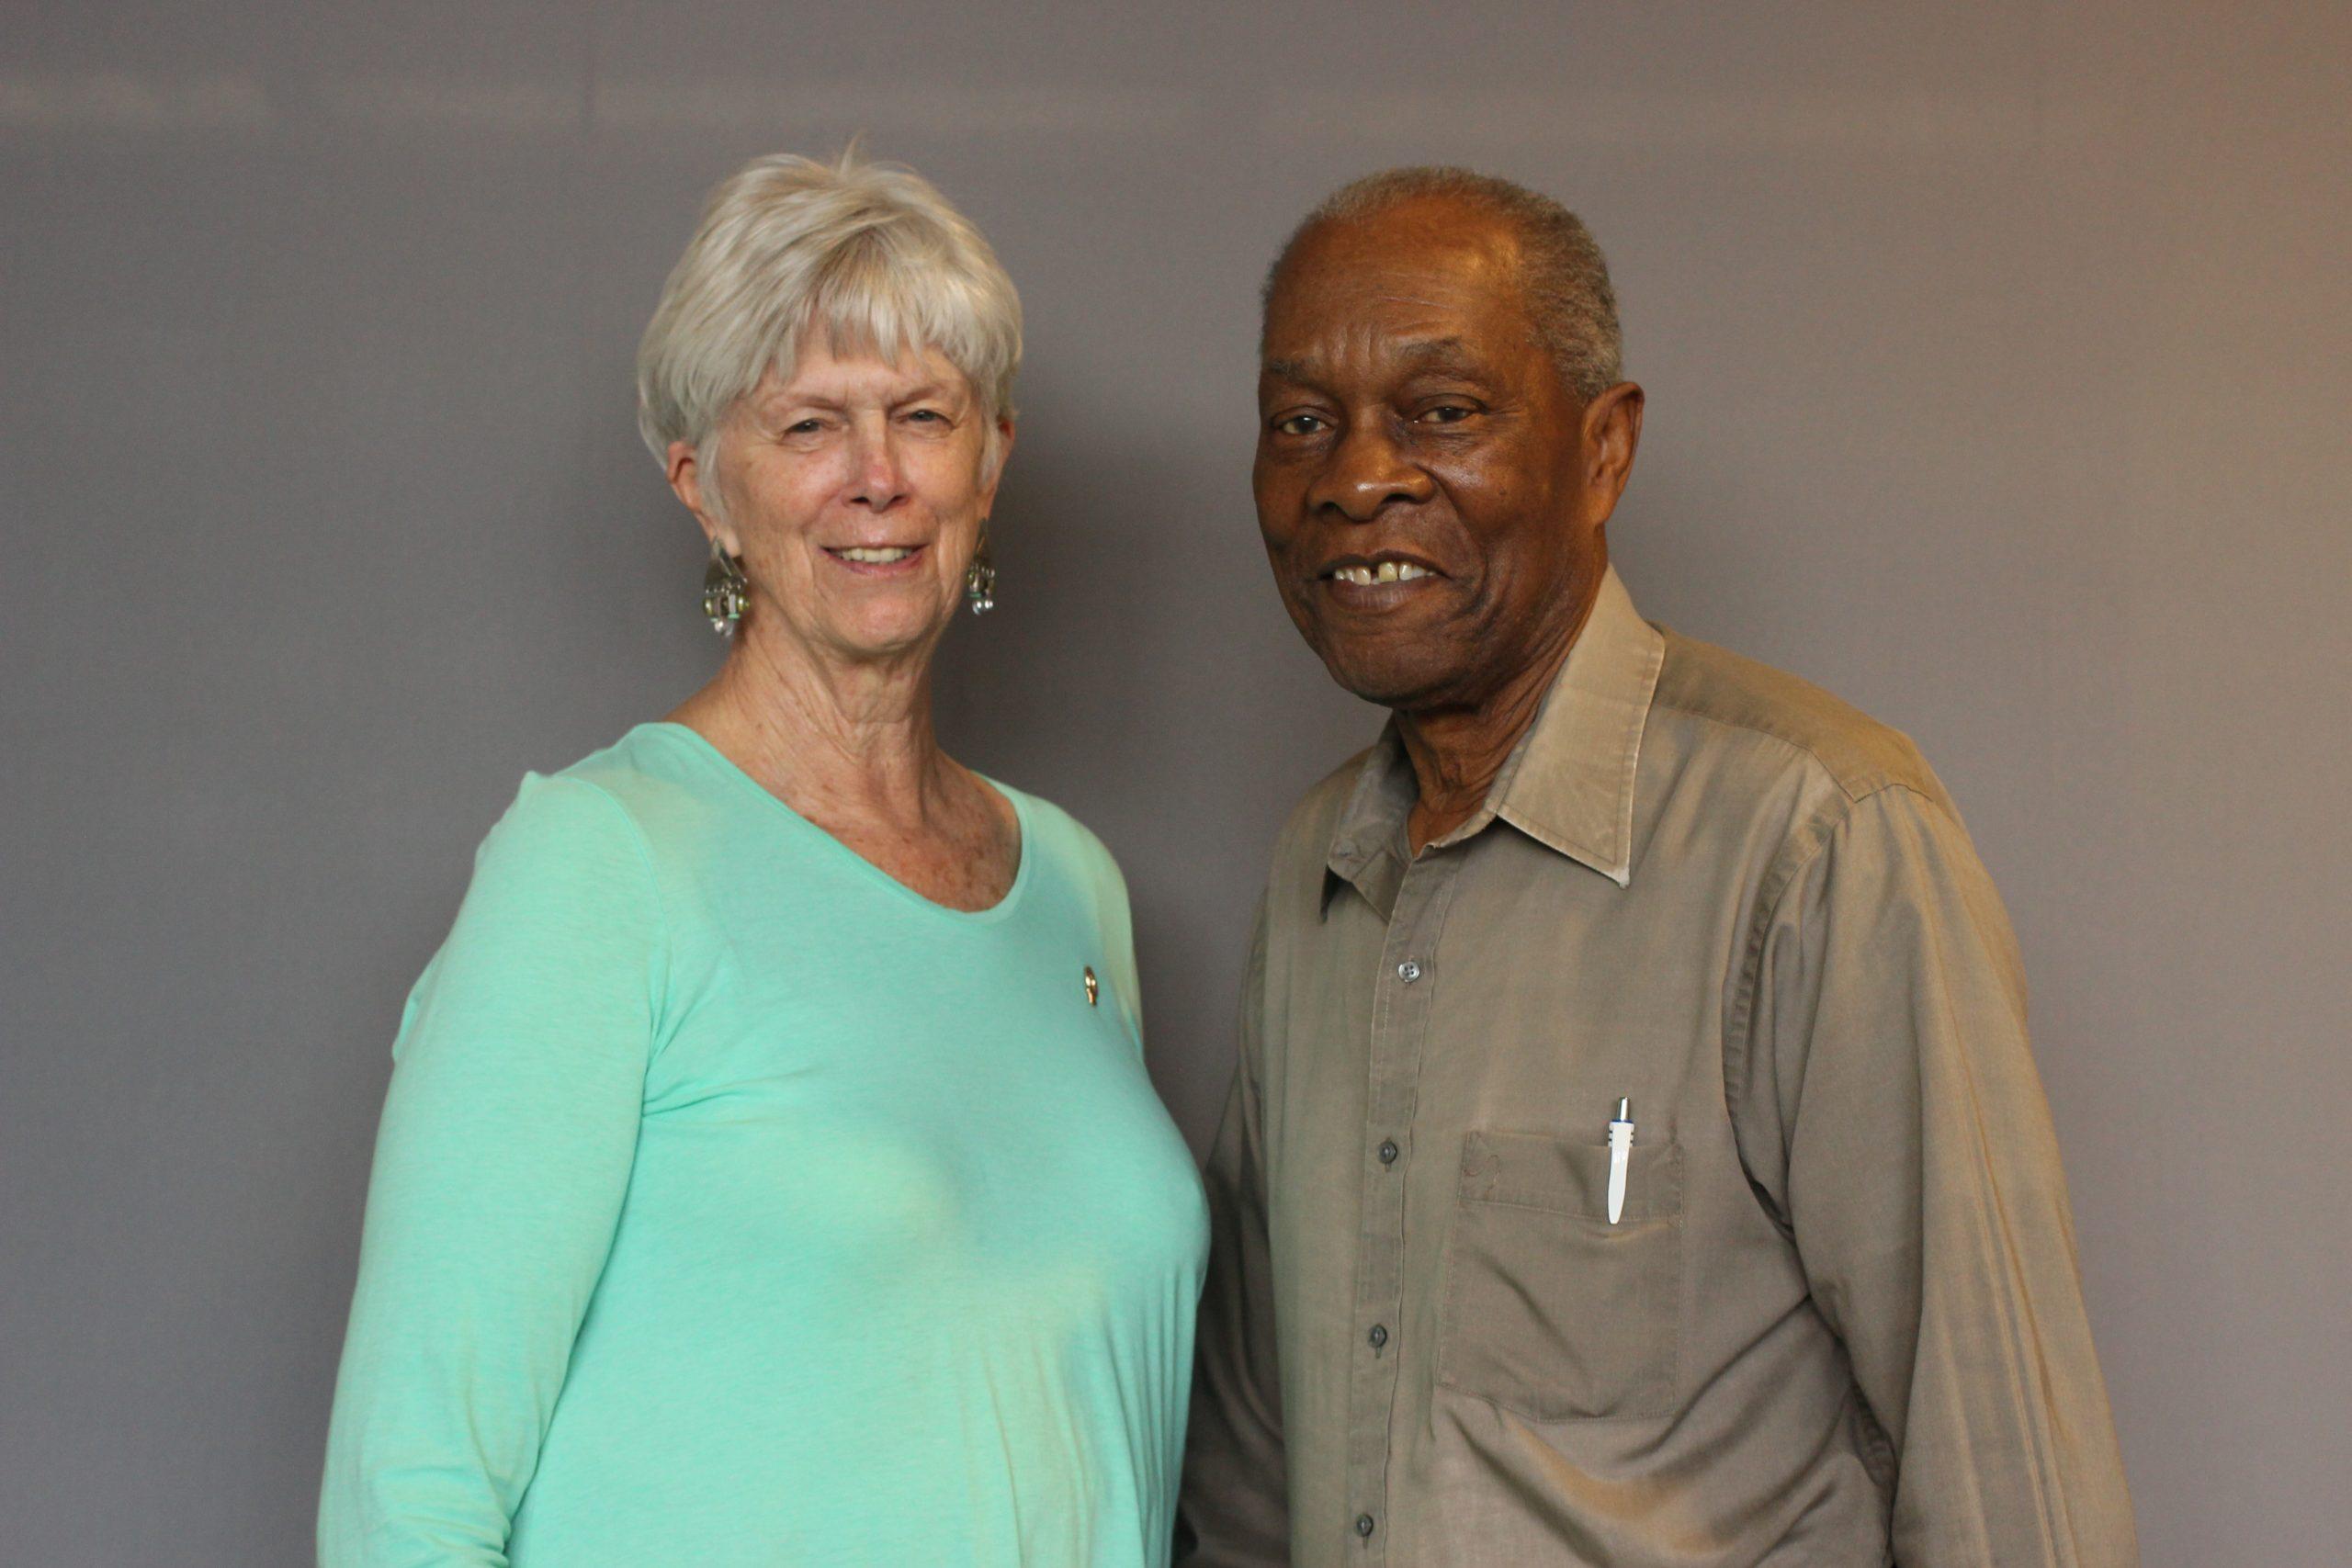 Robert Munn and Karen Dannowitz